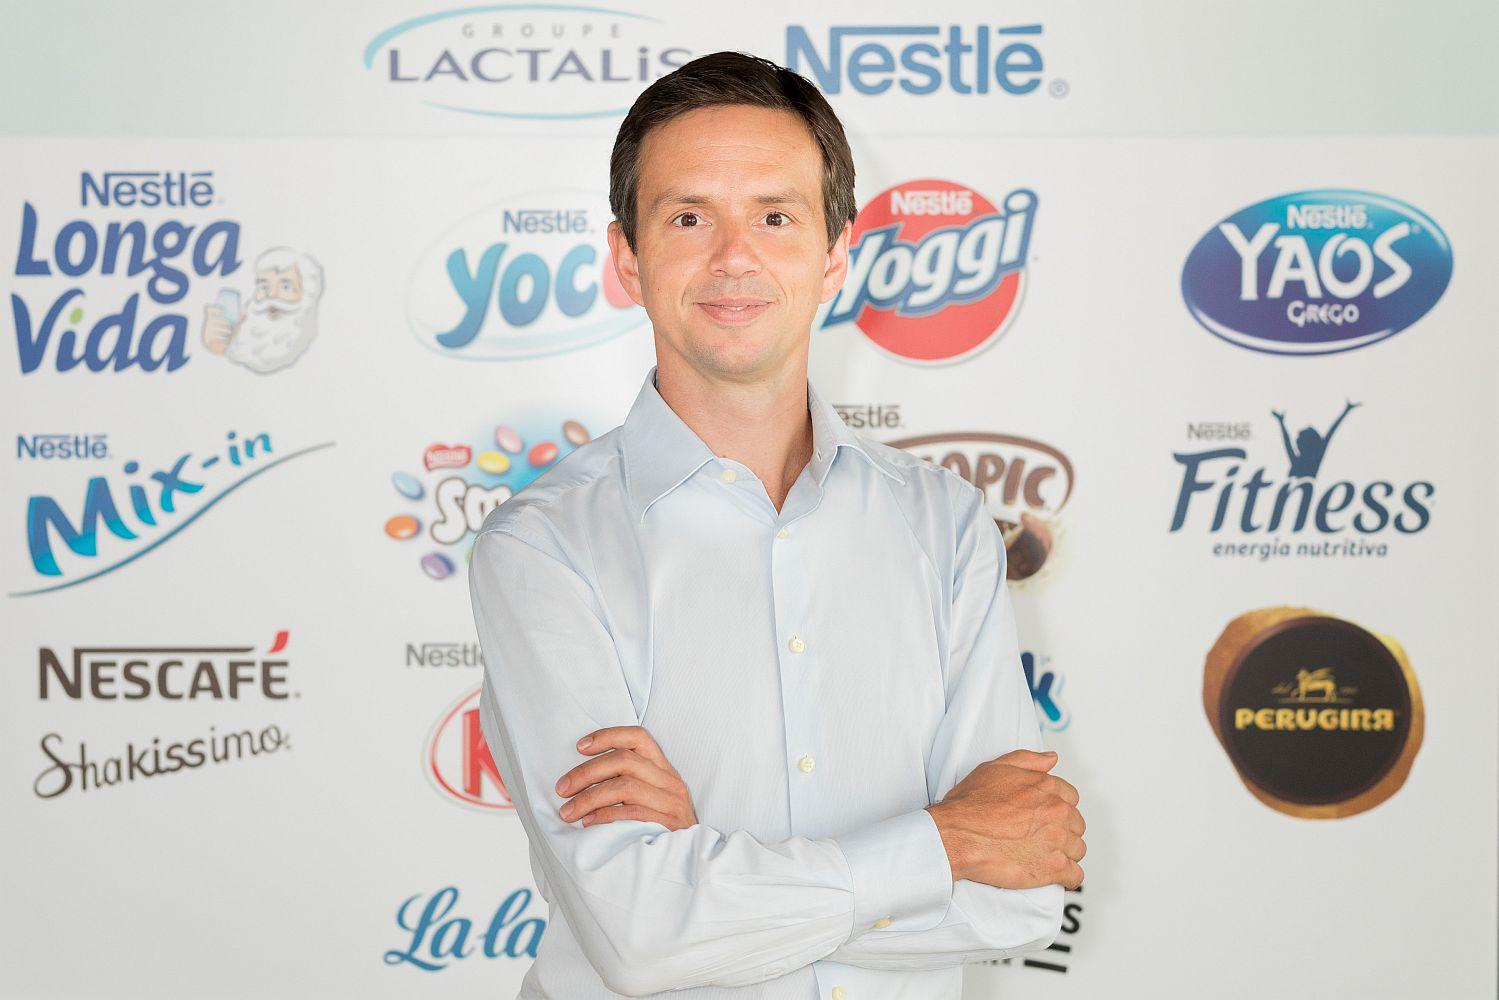 CEO da Lactalis-Nestlé Portugal